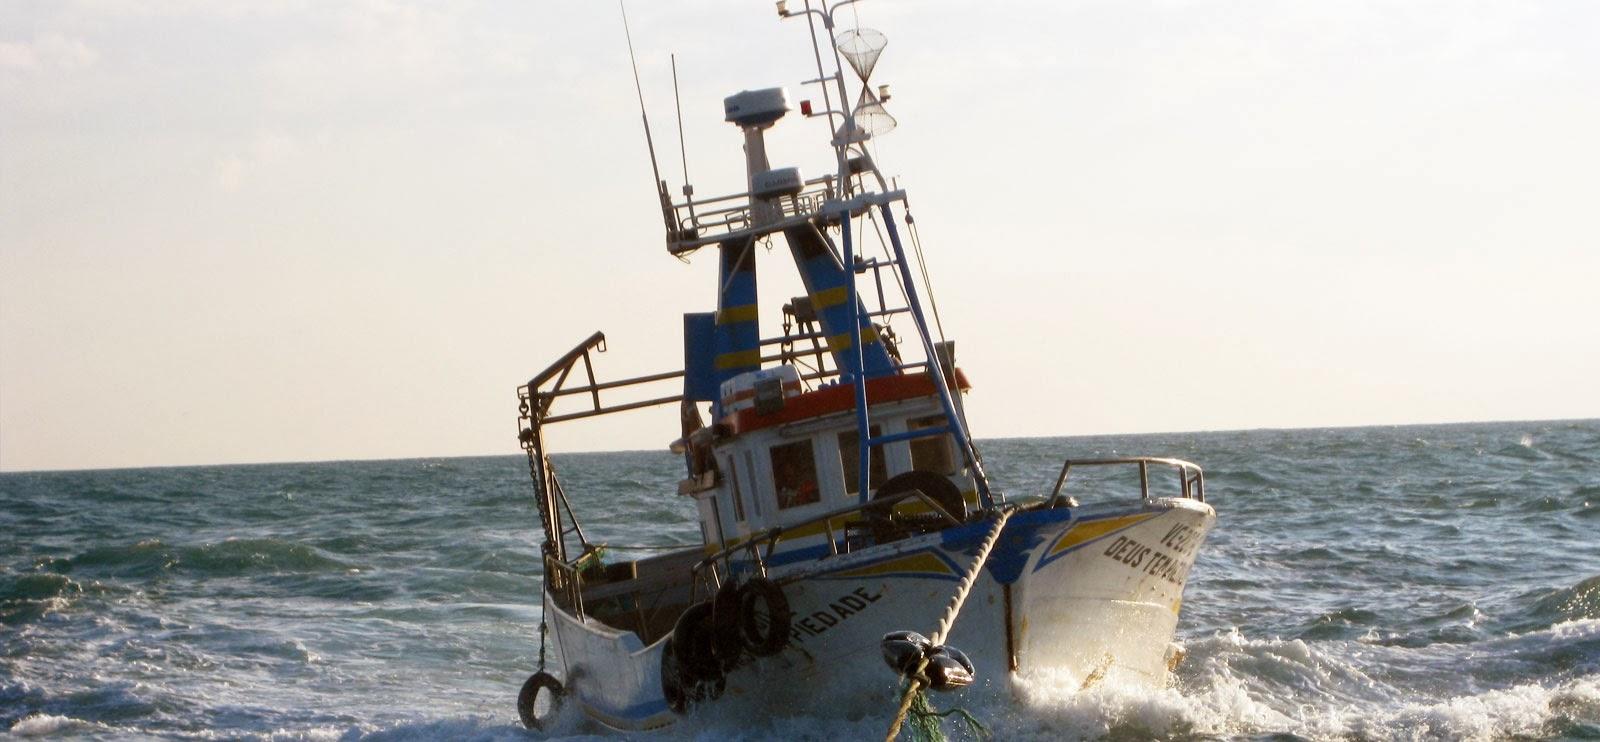 http://www.marinha.pt/pt-pt/servicos/informacao-maritima/PublishingImages/aviso_navegantes.jpg?w=1600